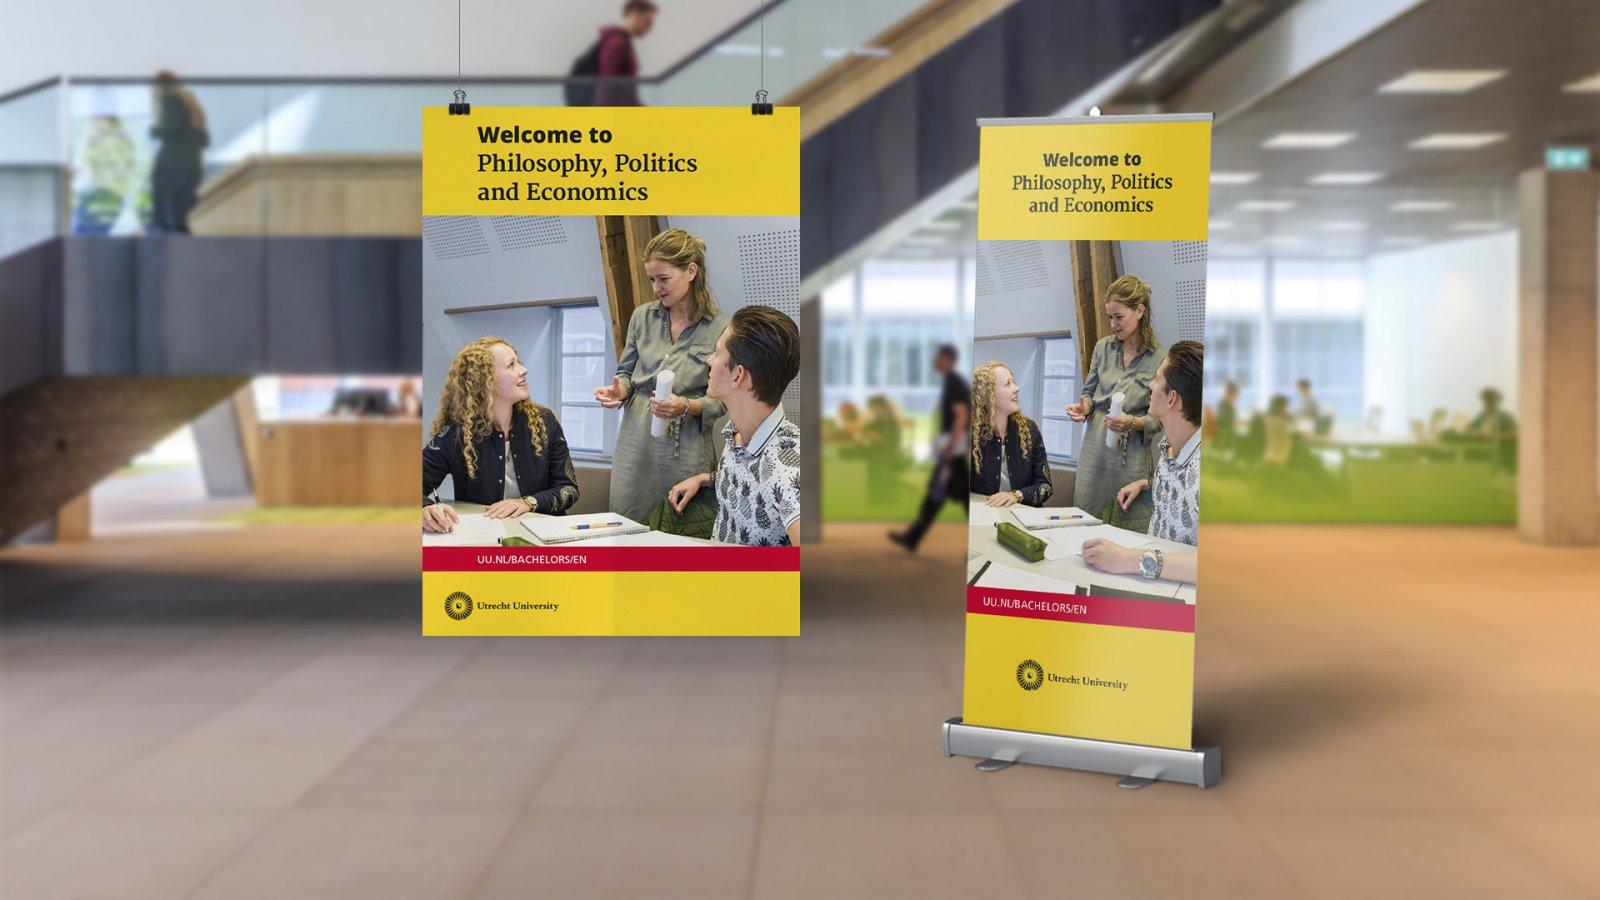 Bachelor communicatie opleidingsbanier en poster